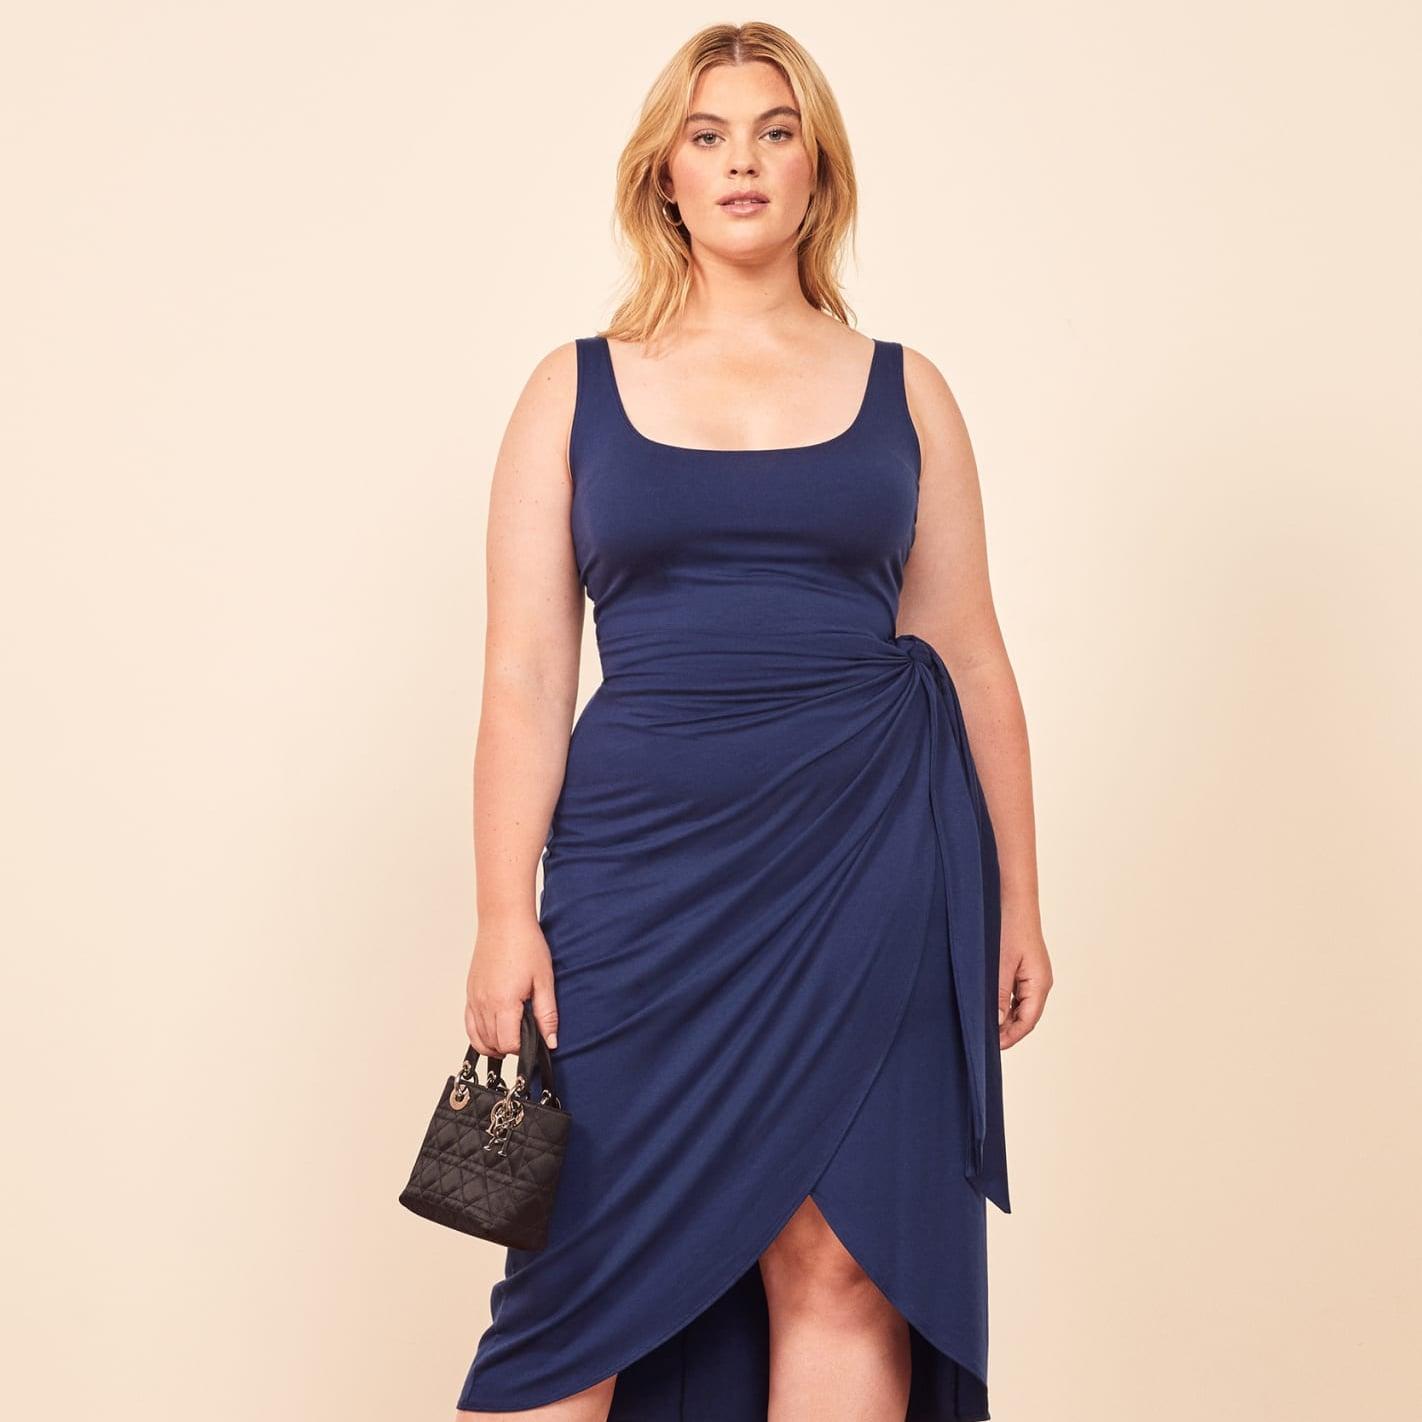 Flattering Plus-Size Dresses  POPSUGAR Fashion